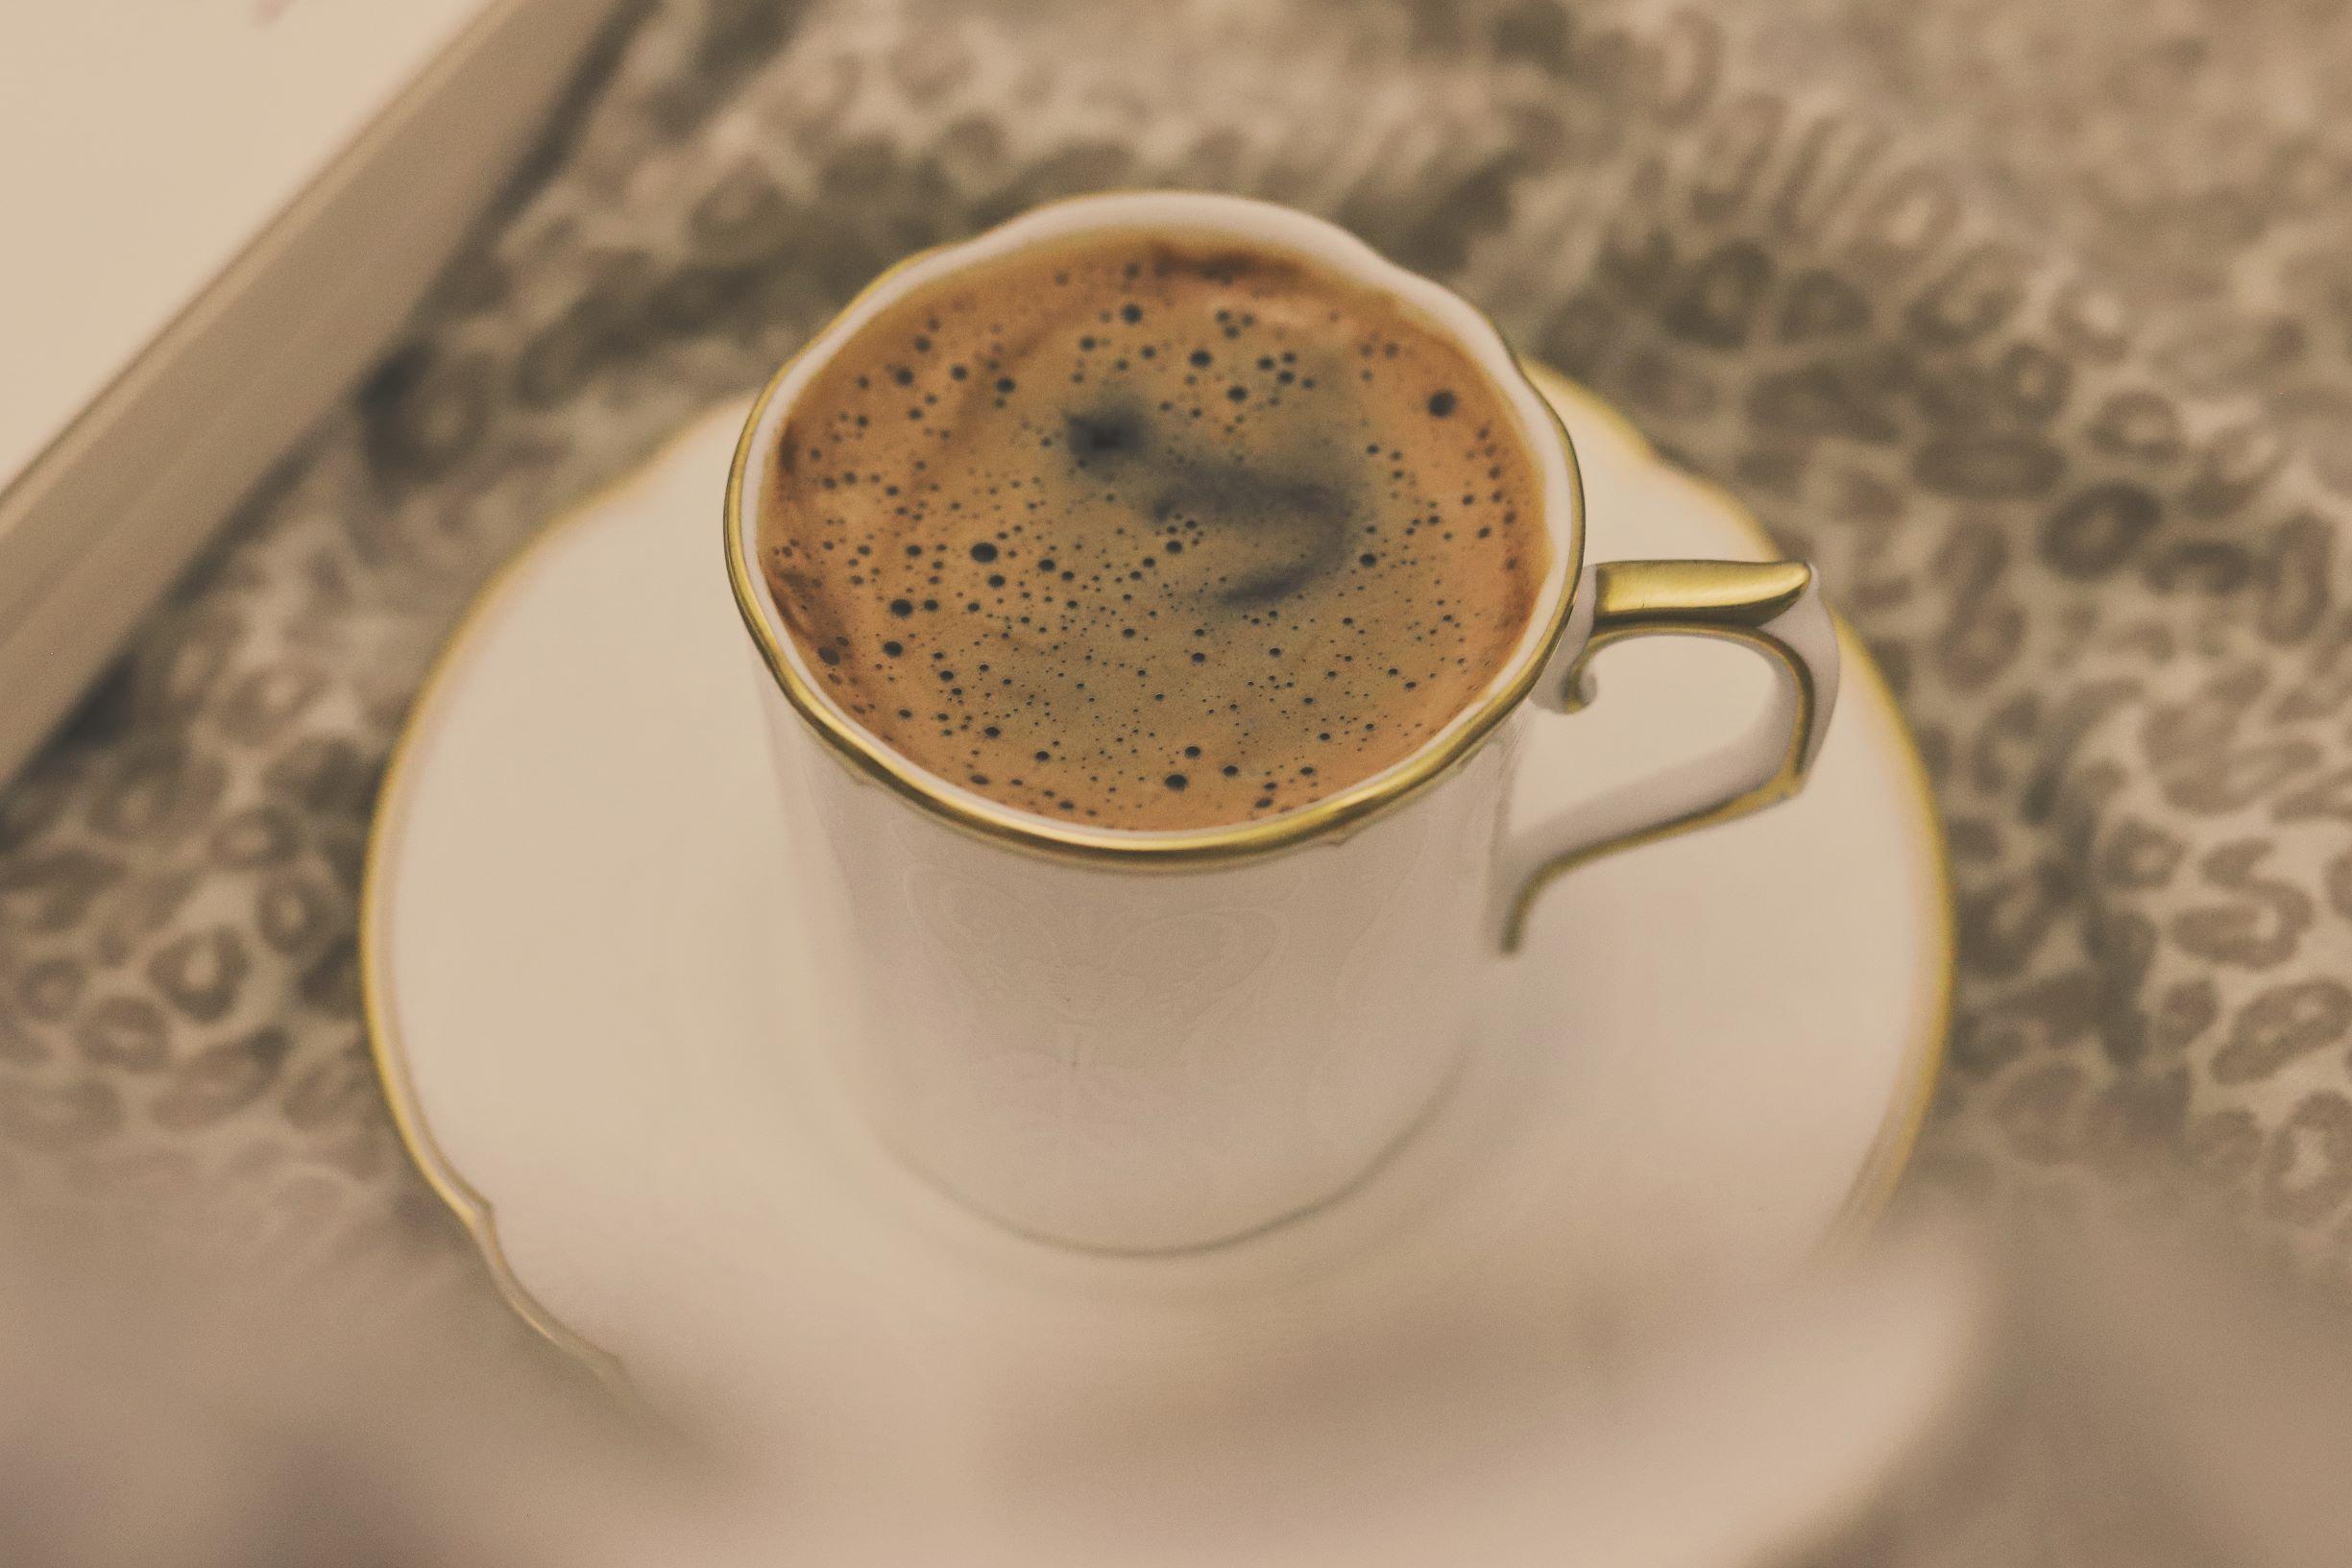 LeClair Organics liberica espresso coffea liberica specialty coffee, ethical coffee and compostable coffee Canada